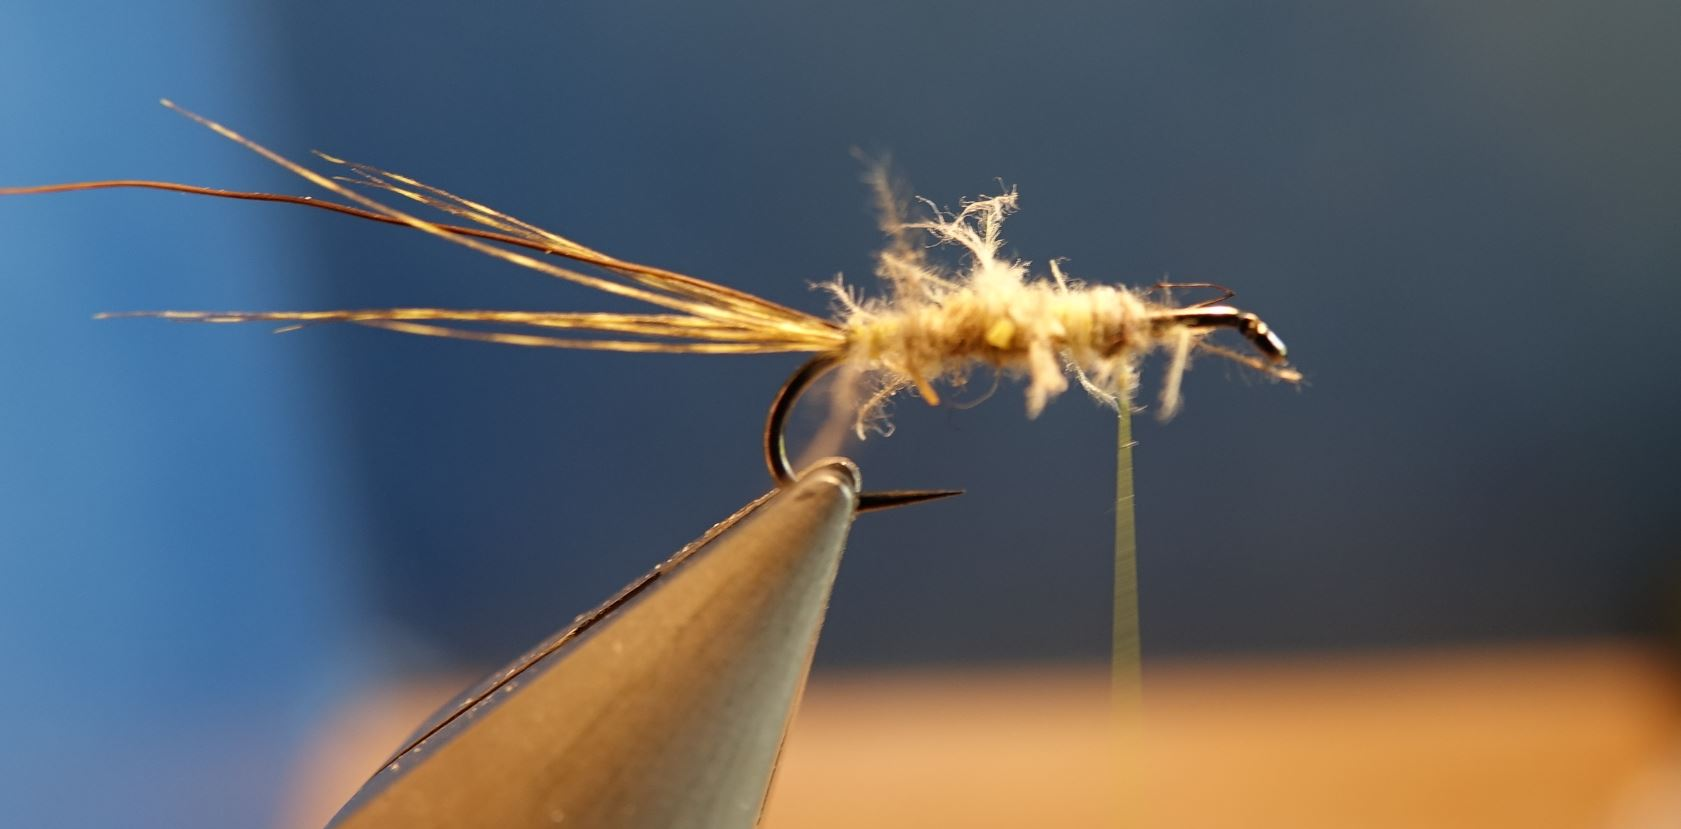 MDM mouche de mai CDC perdrix plume partridge mouche fly tying eclosion 1